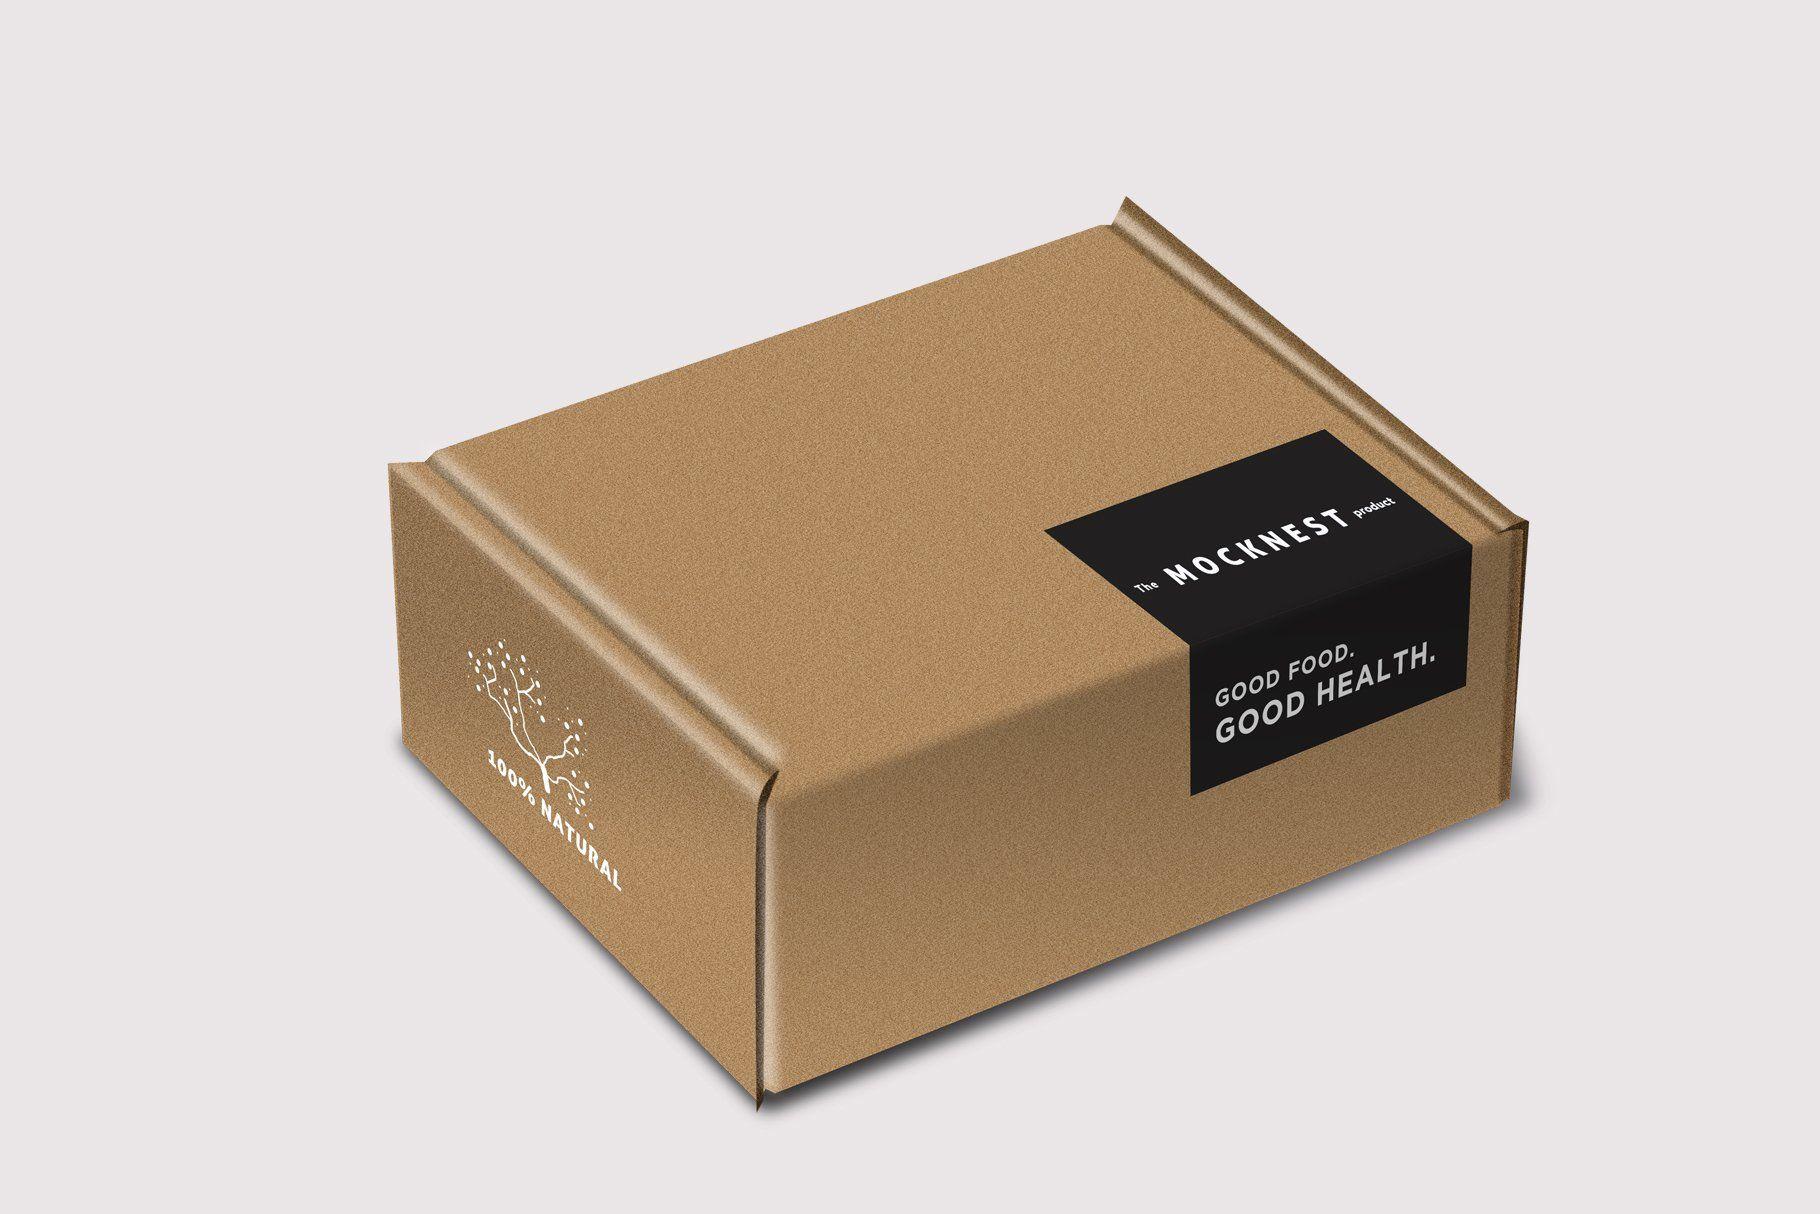 Download Cardboard Box Mockup Packaging Stickers Box Packaging Design Food Box Packaging